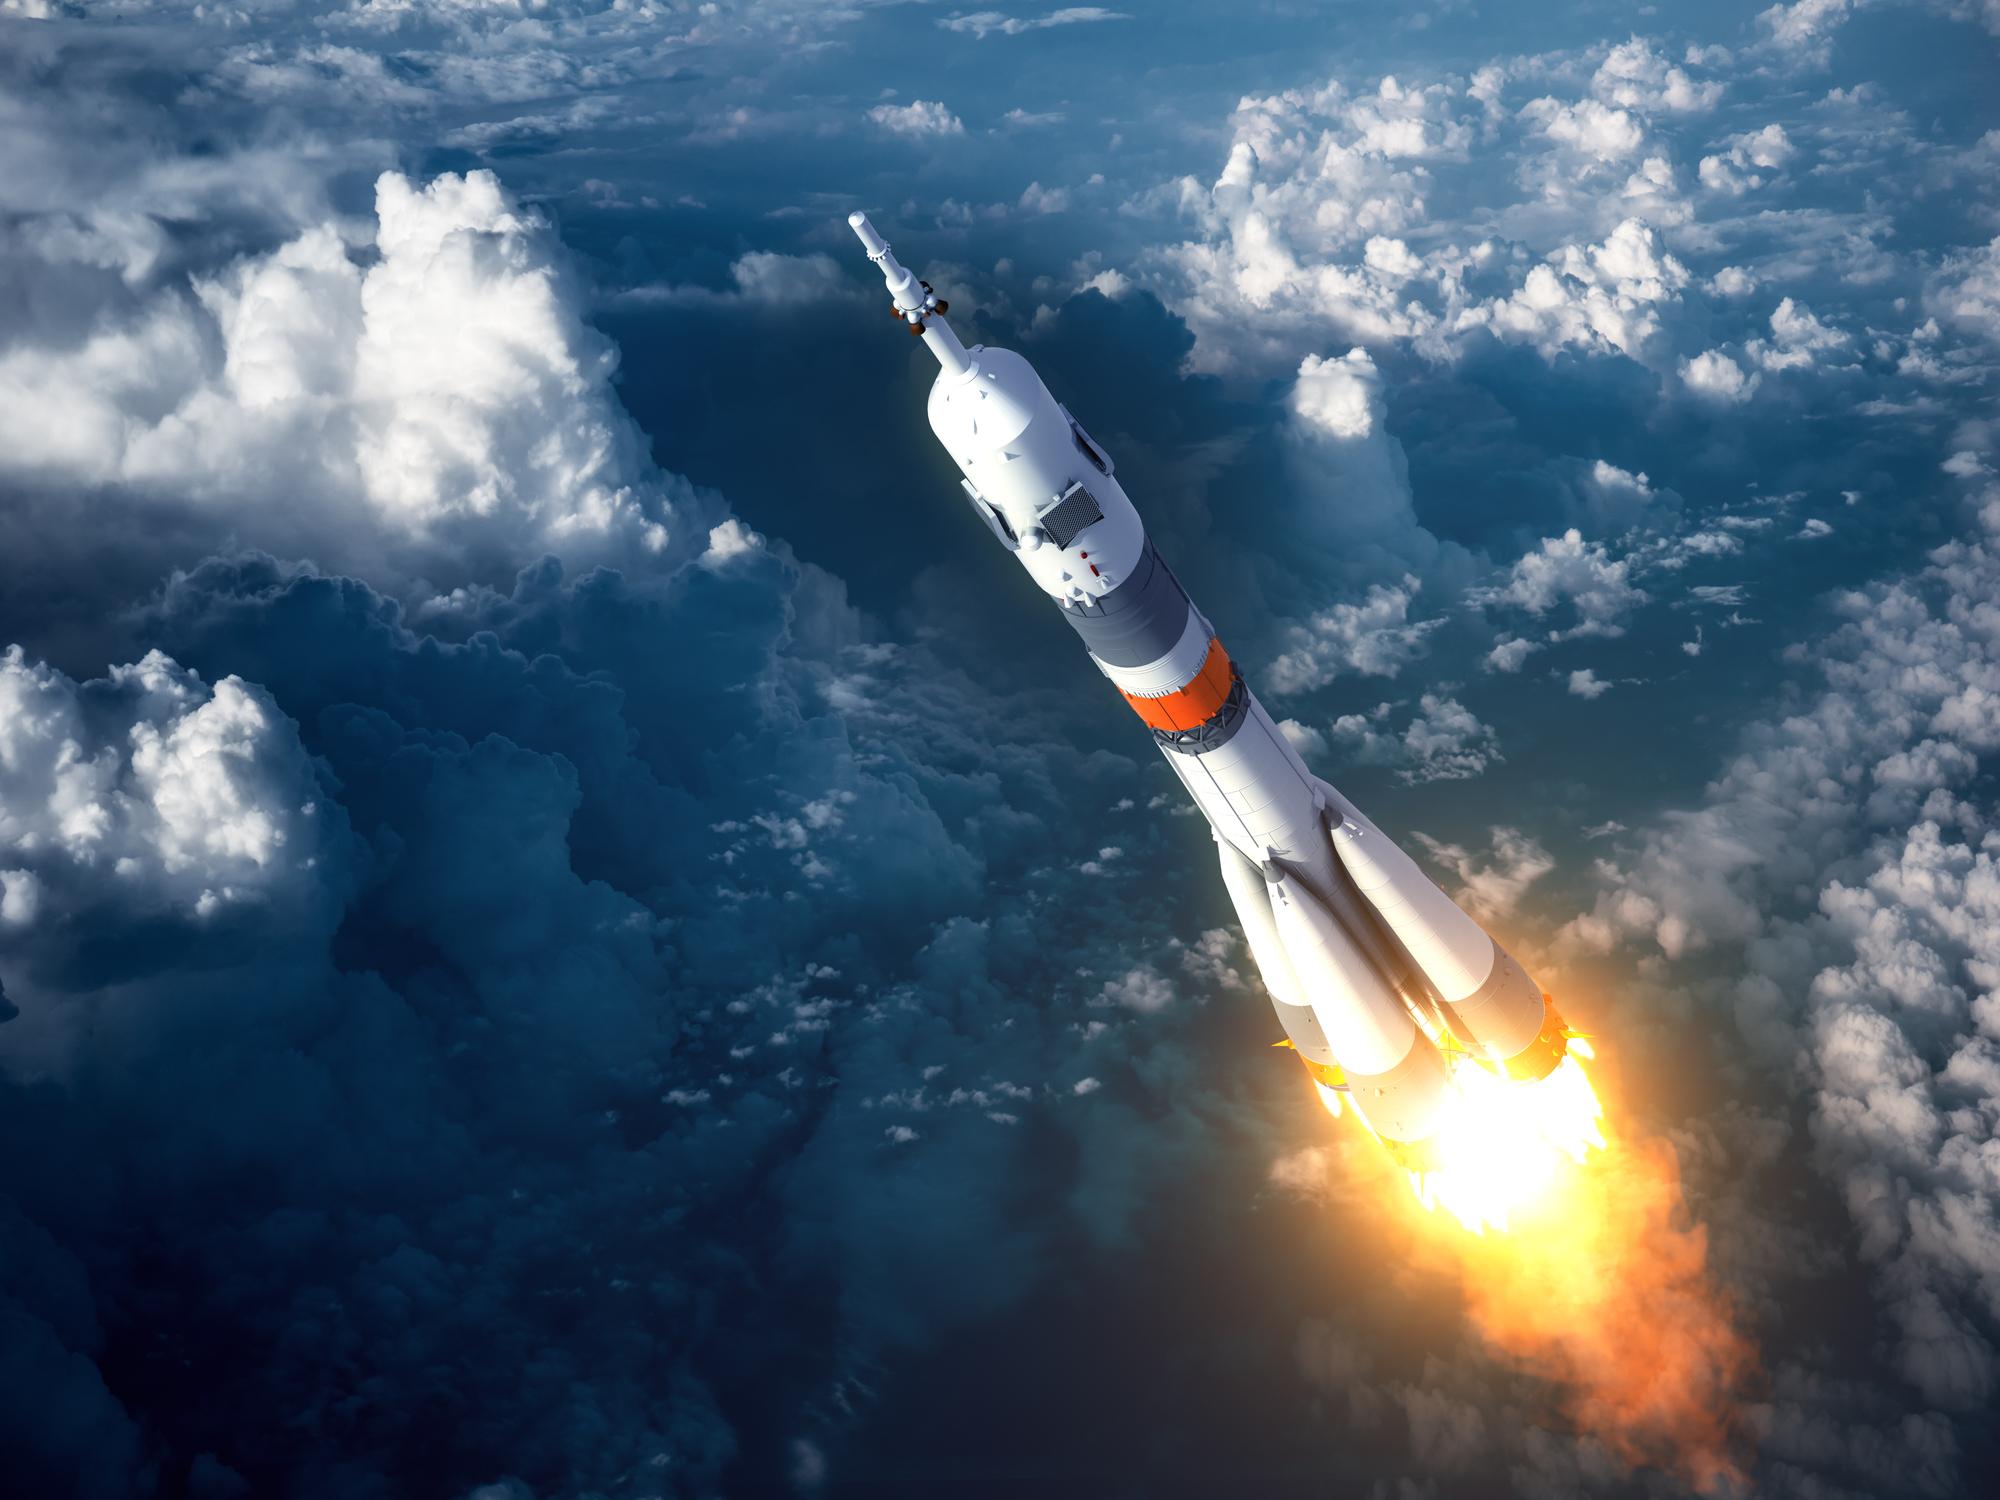 A rocket ship soaring into space.